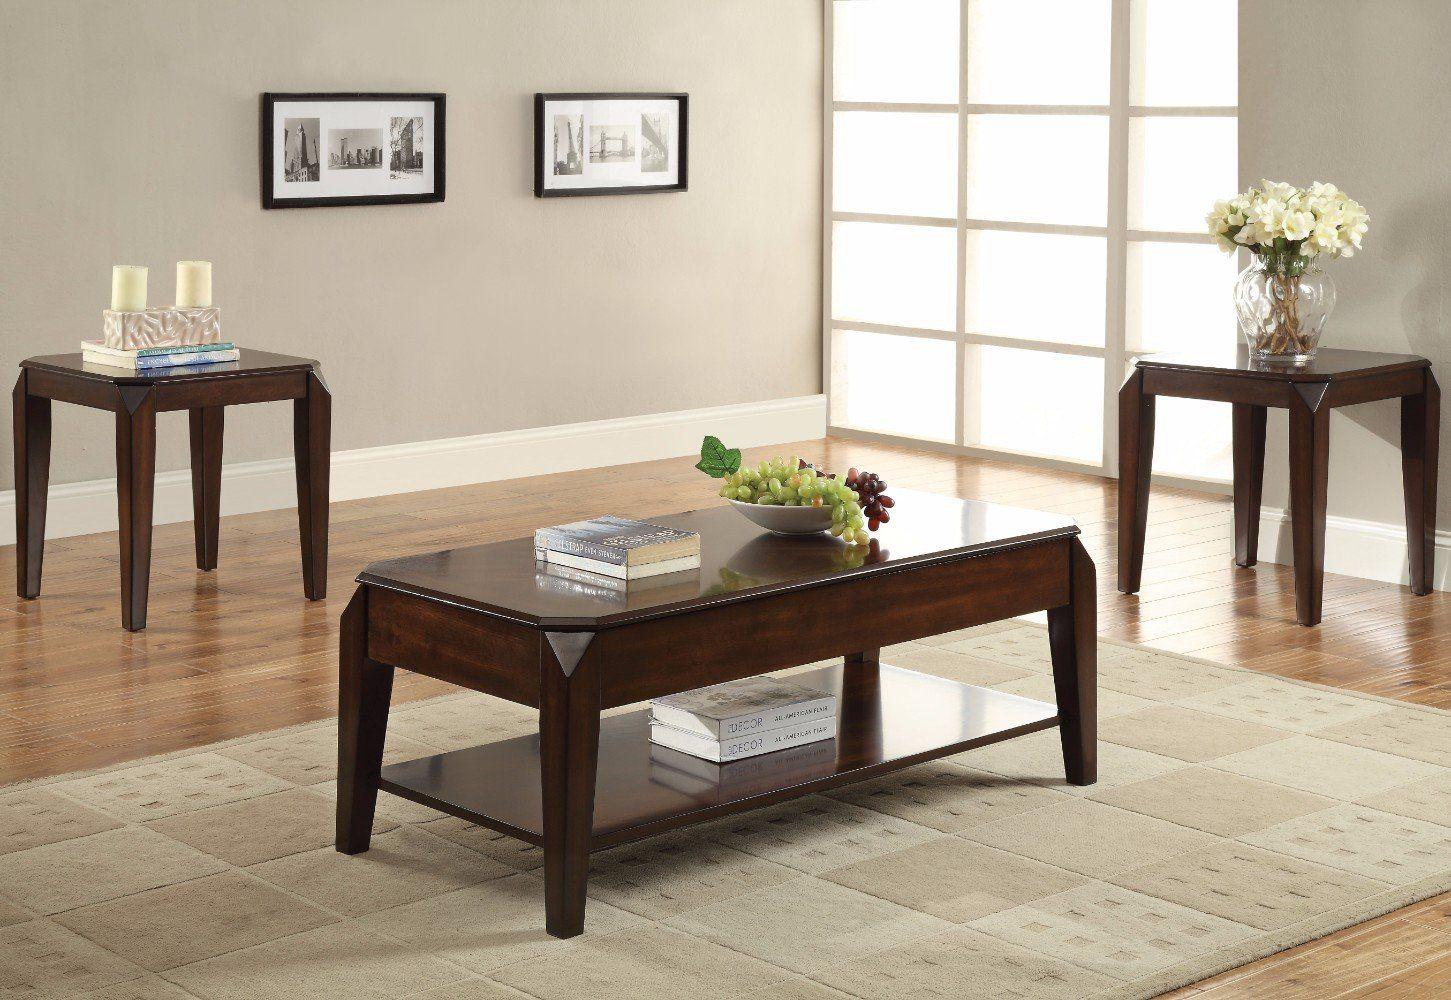 140 Tea Table Ideas In 2021 Coffee Table Design Coffee Table Tea Table